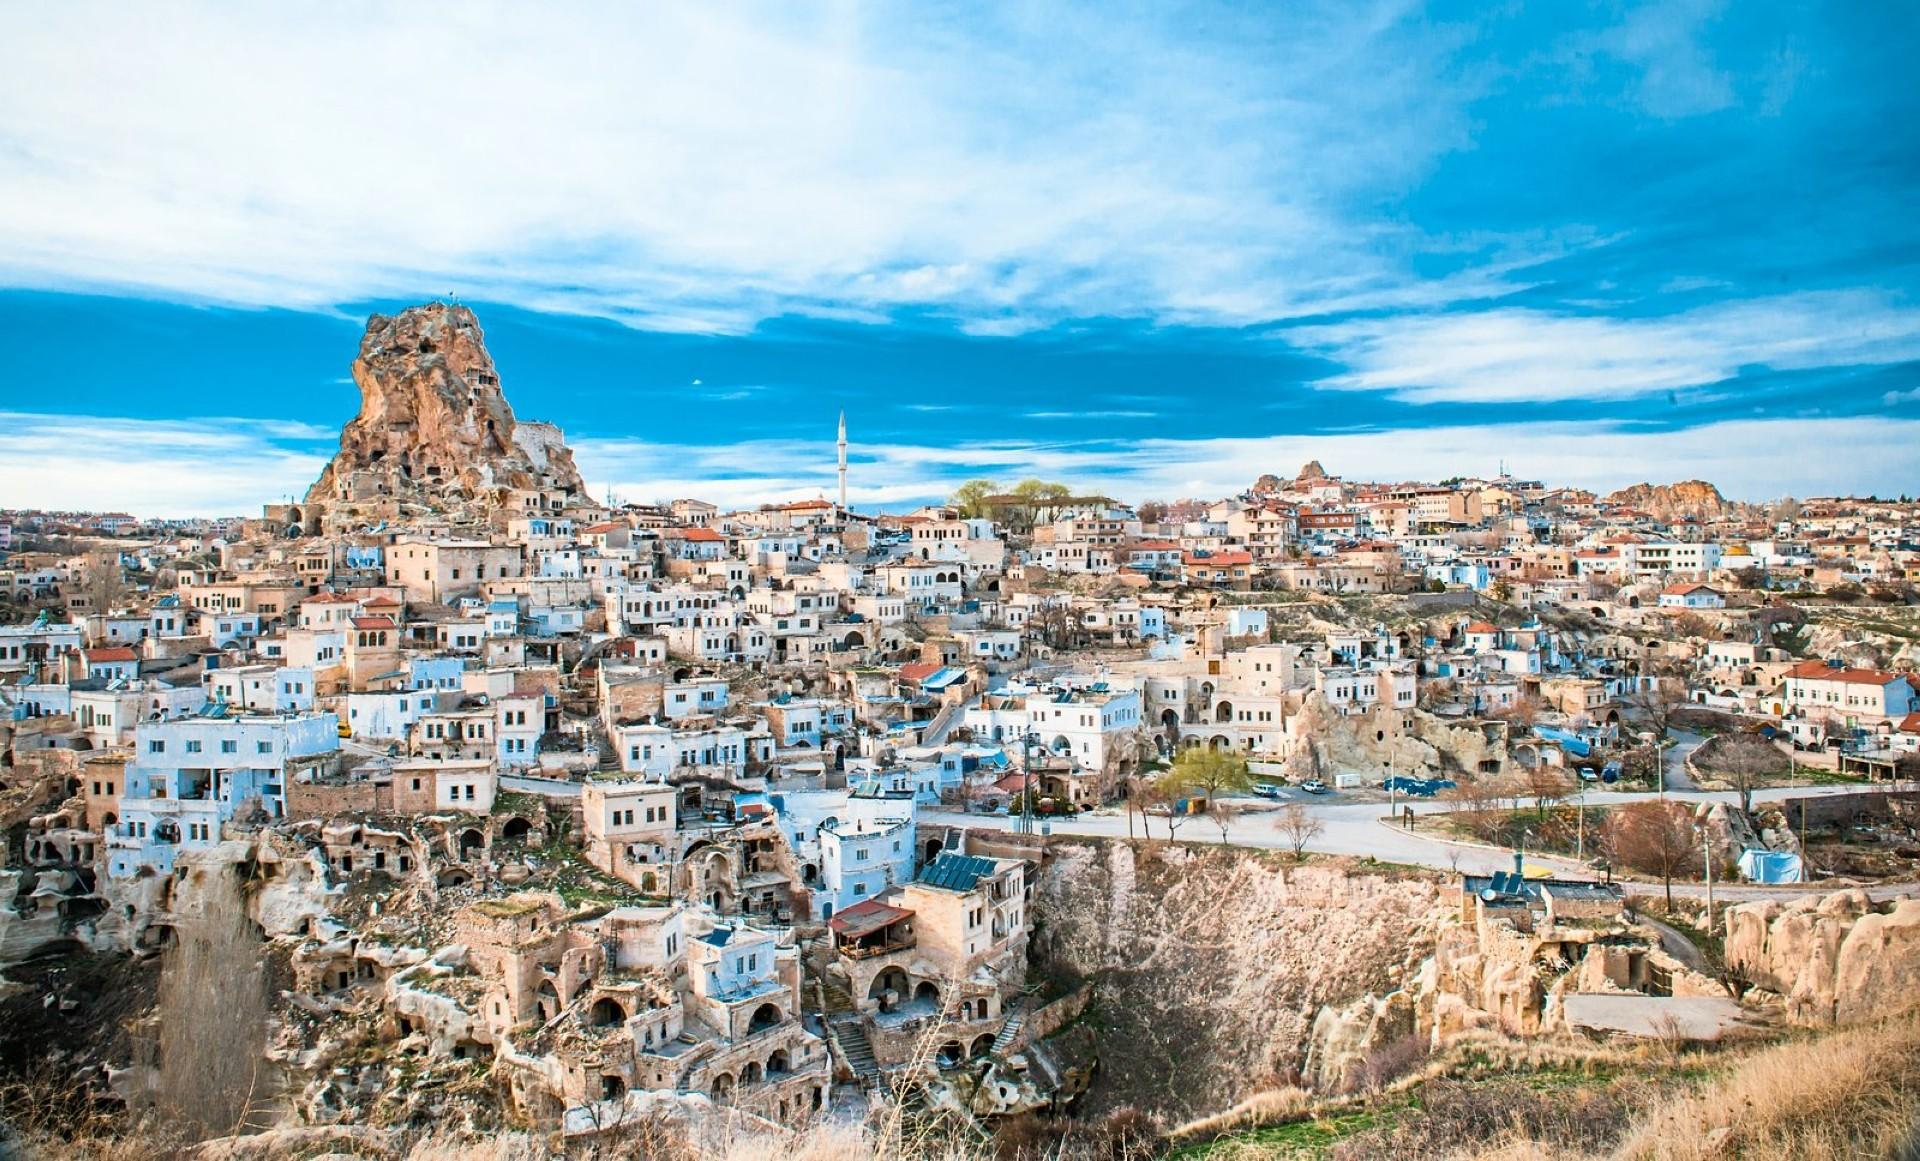 Cappadocia townscape in Turkey. — Insight Vacations